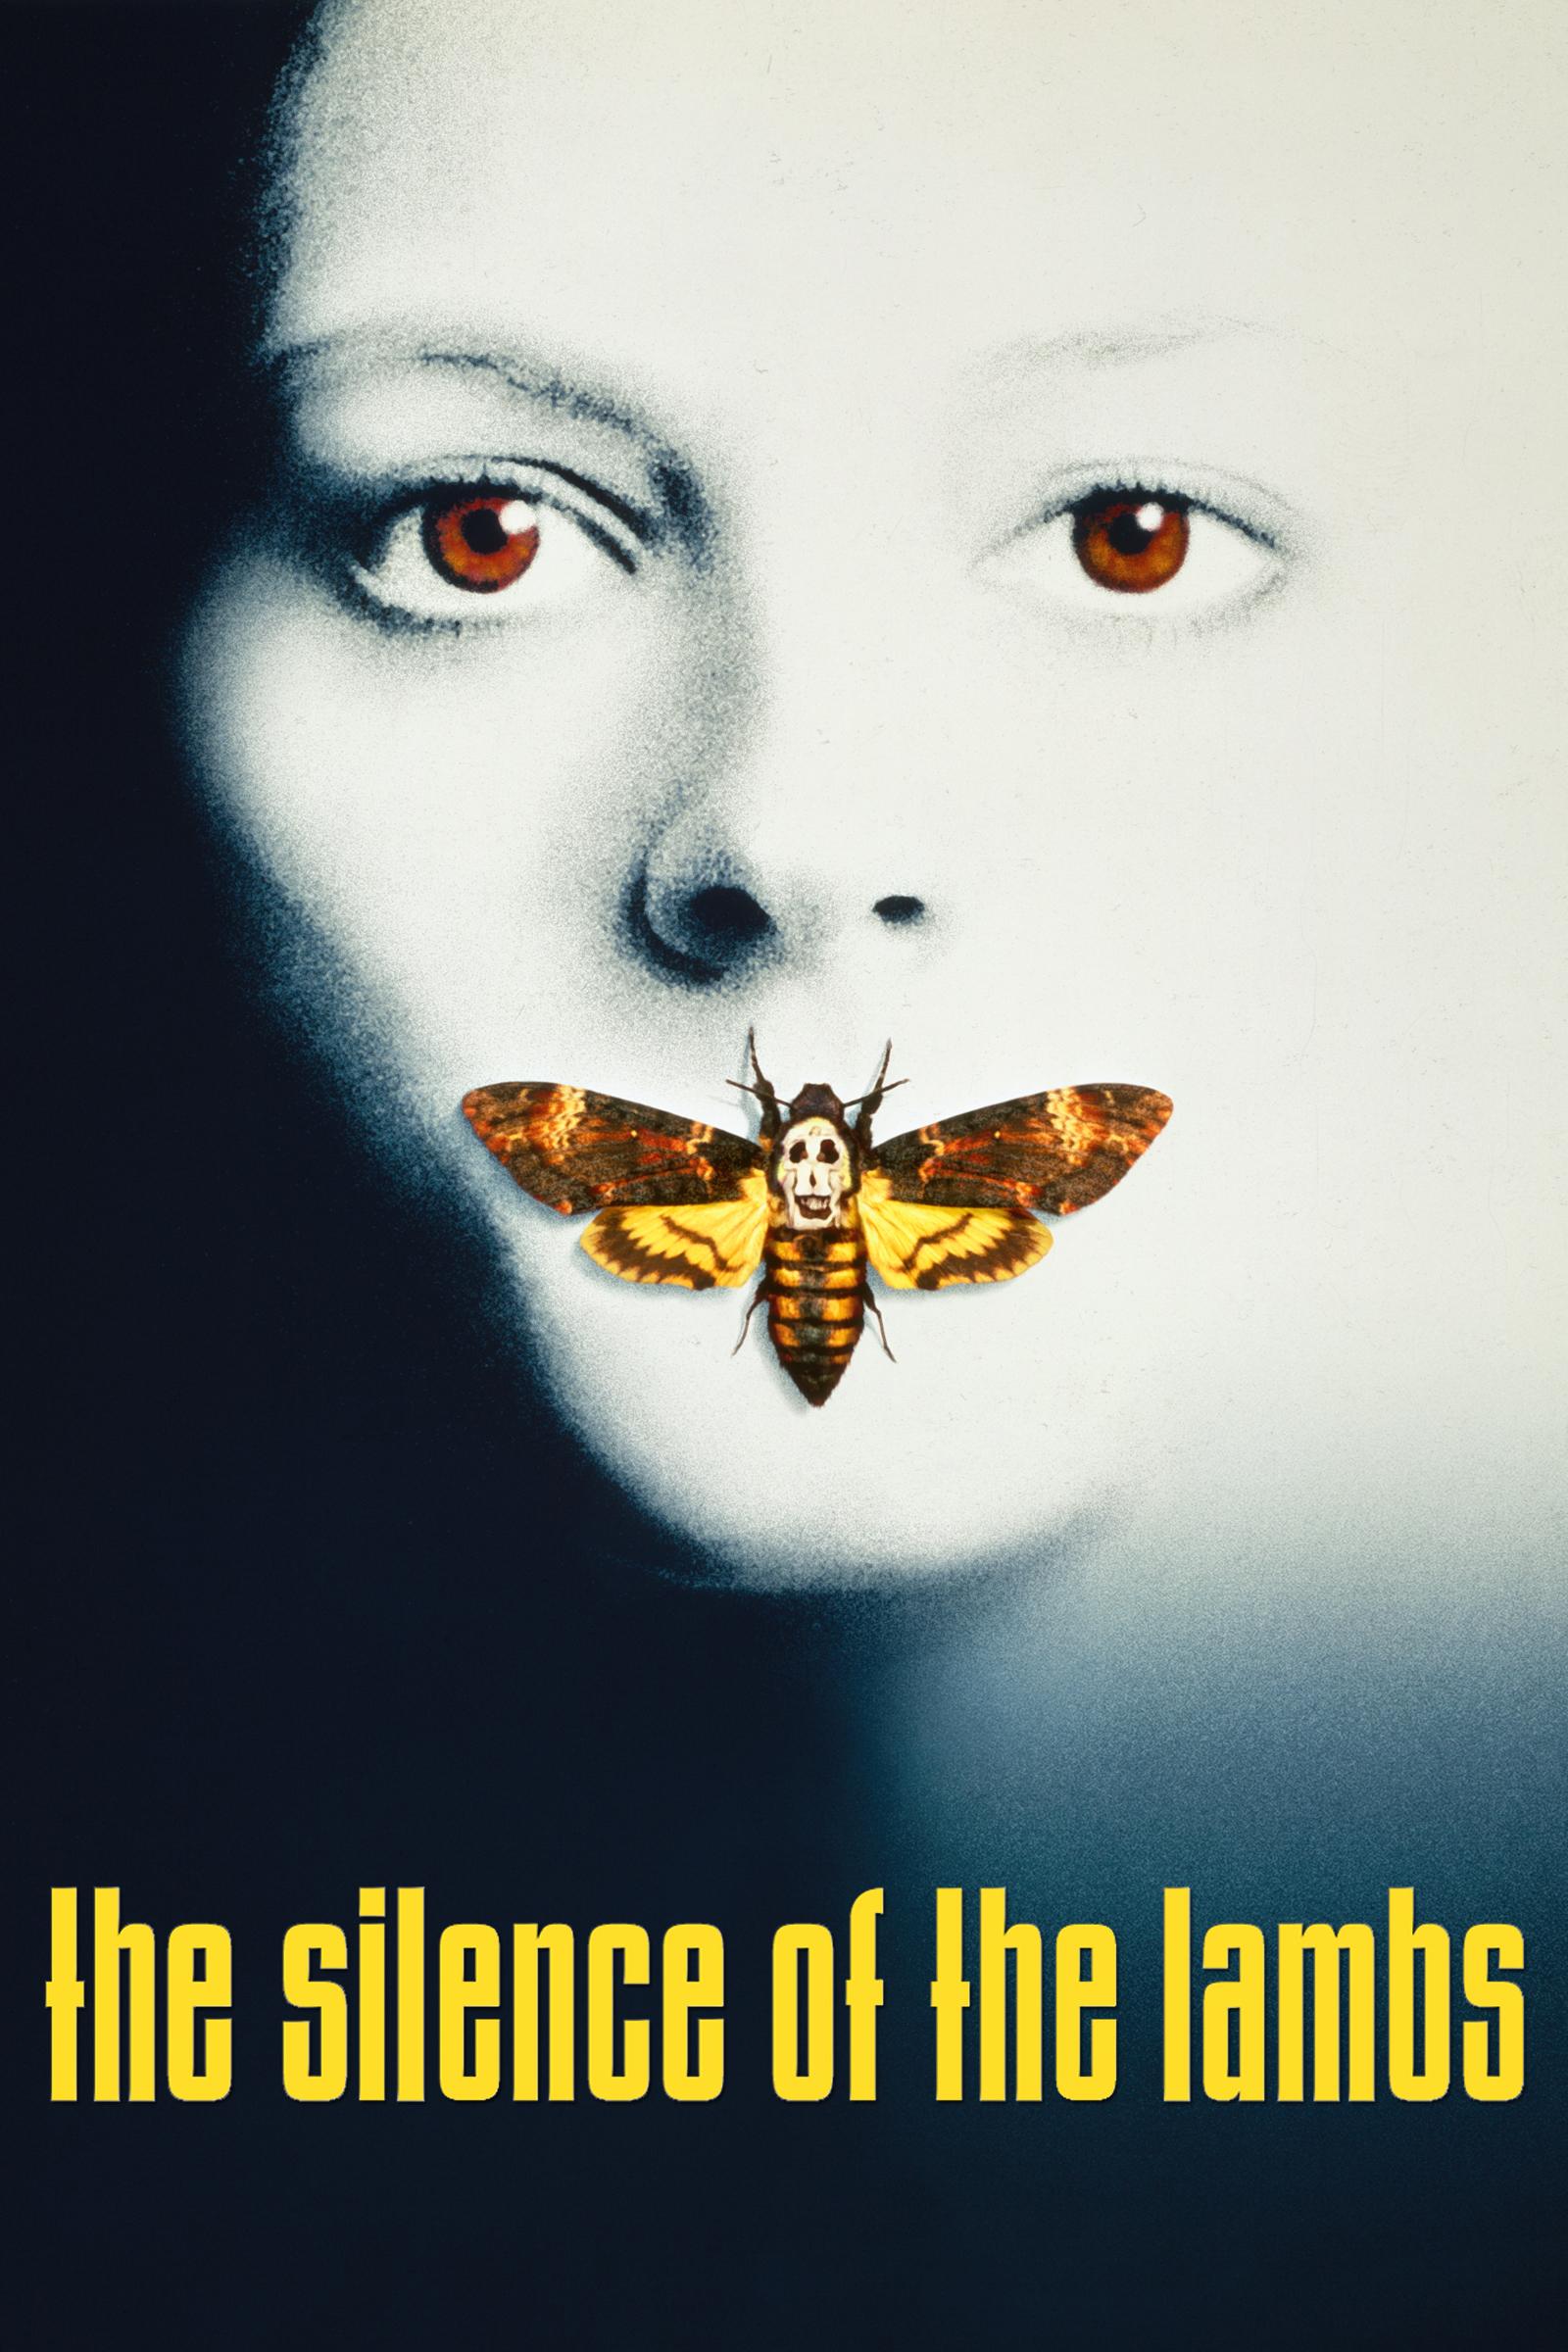 The-Silence-of-the-Lambs_poster_Film Detektif Terbaik